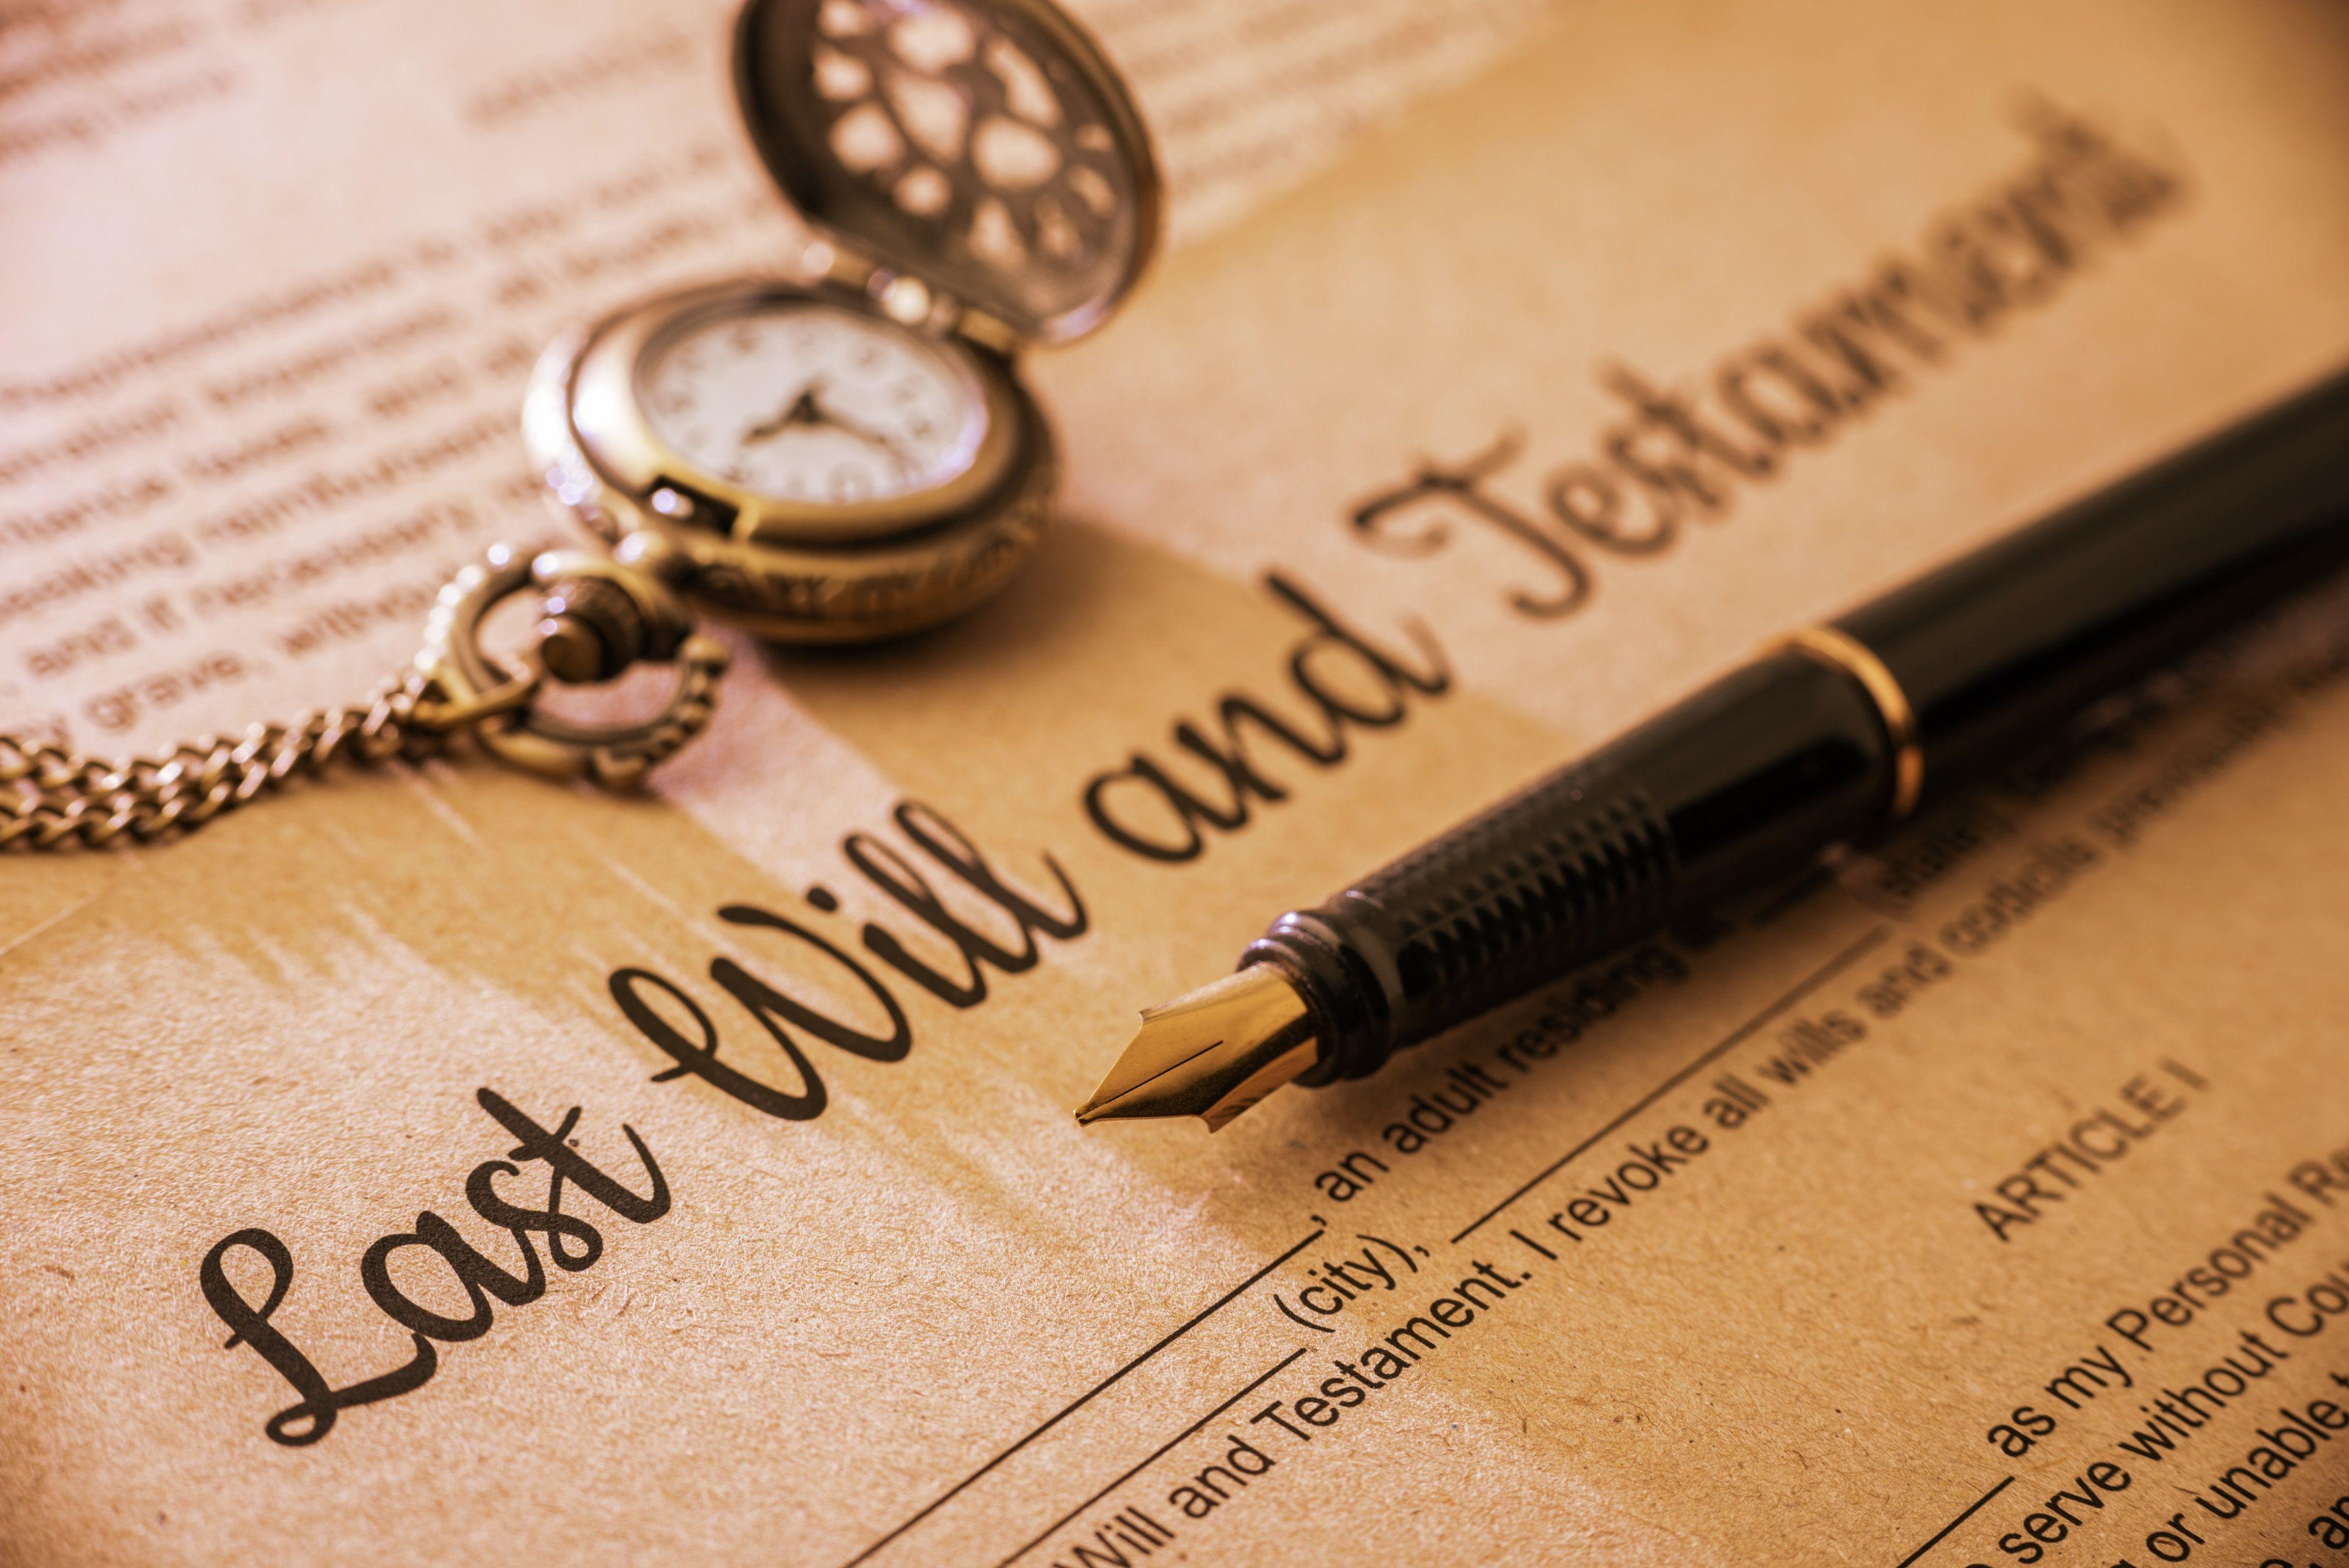 Solicitors still the best way to arrange wills